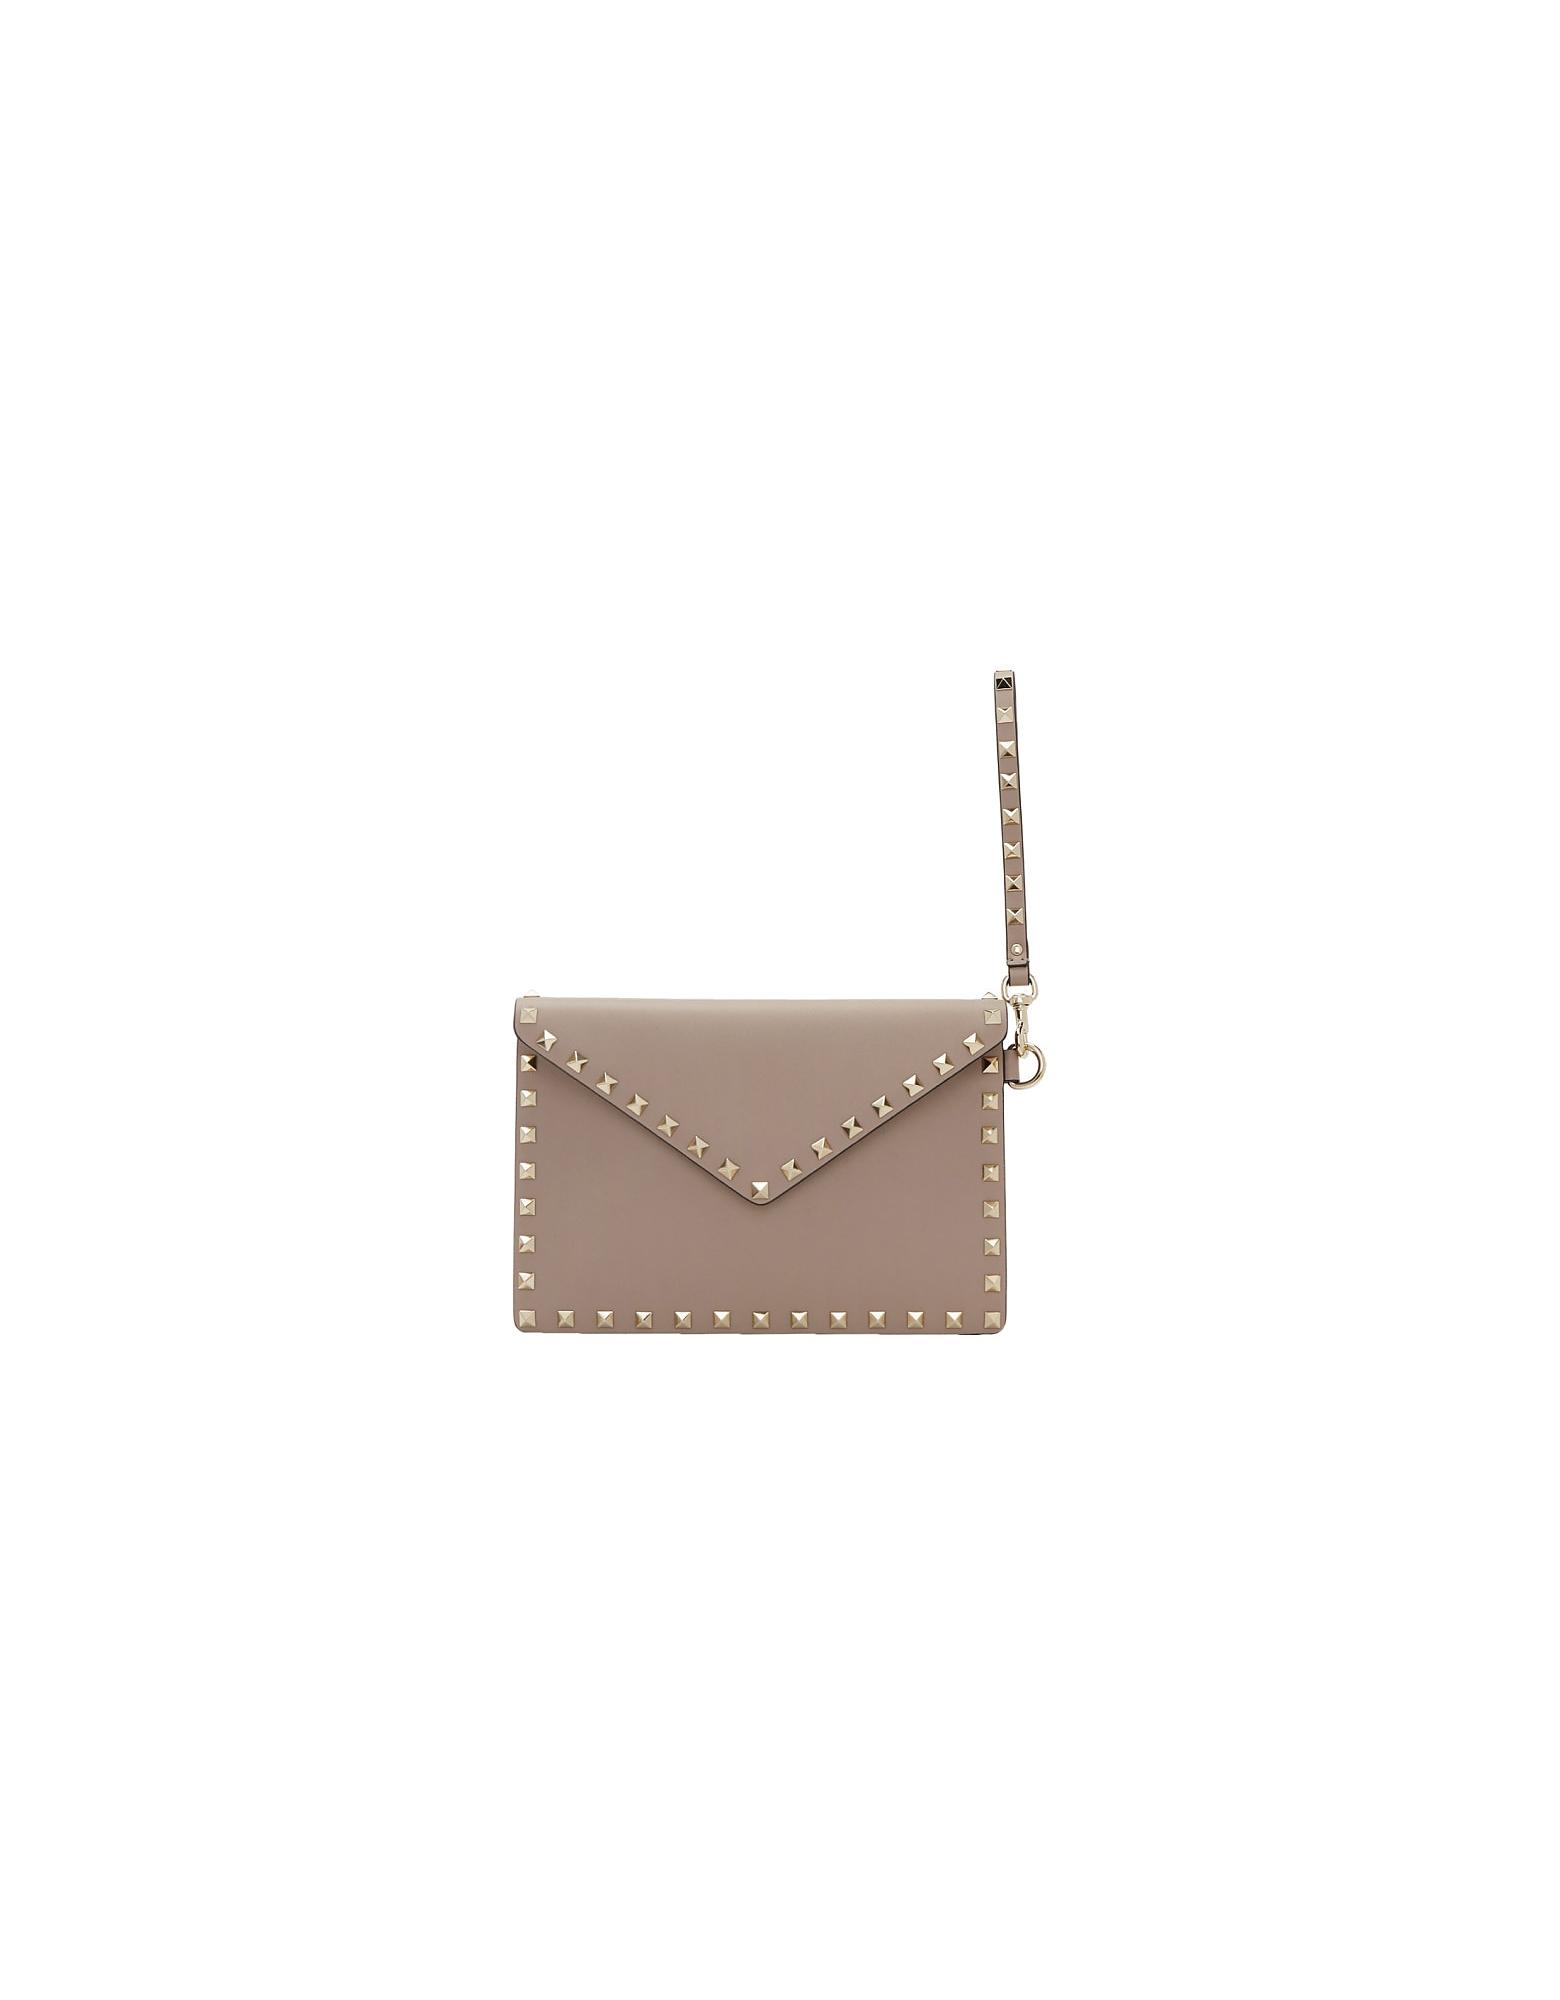 Valentino Designer Handbags, Pink Valentino Garavani Rockstud Pouch